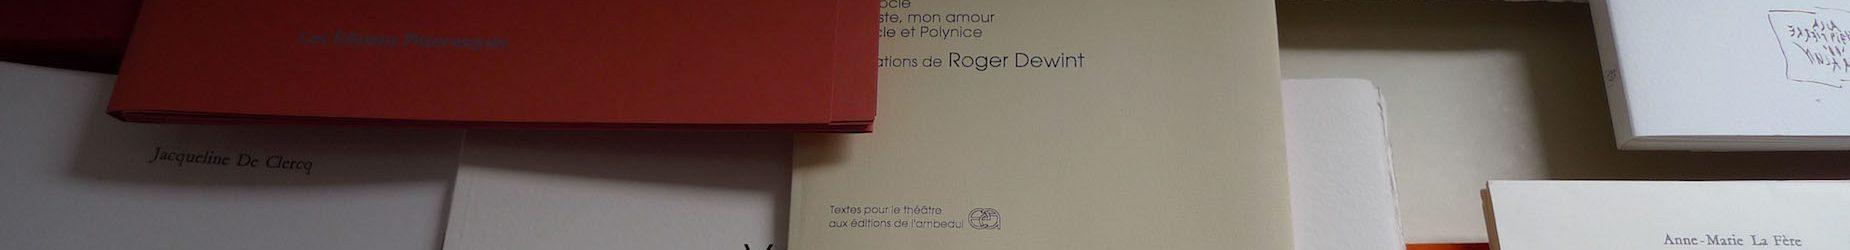 Fondation Roger Dewint